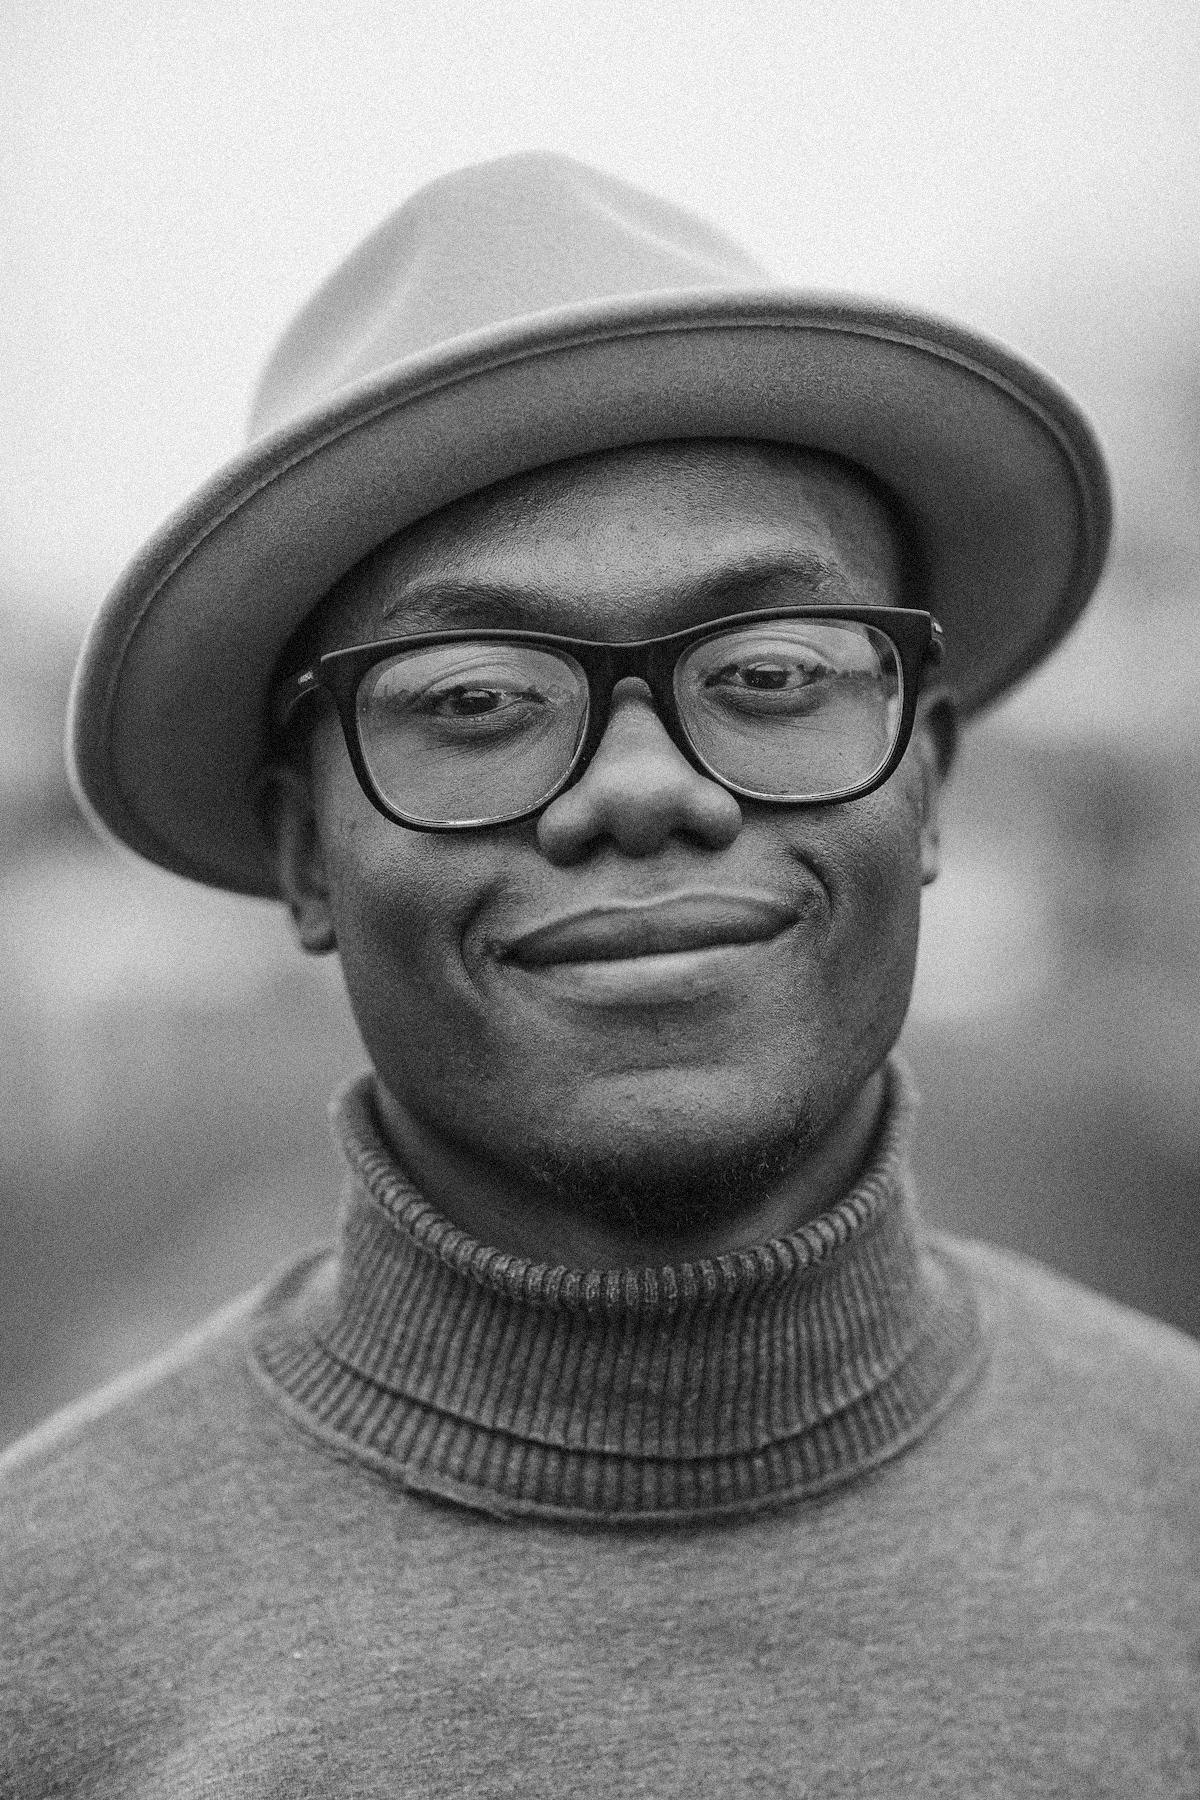 Remy Ngamije - Profile 3